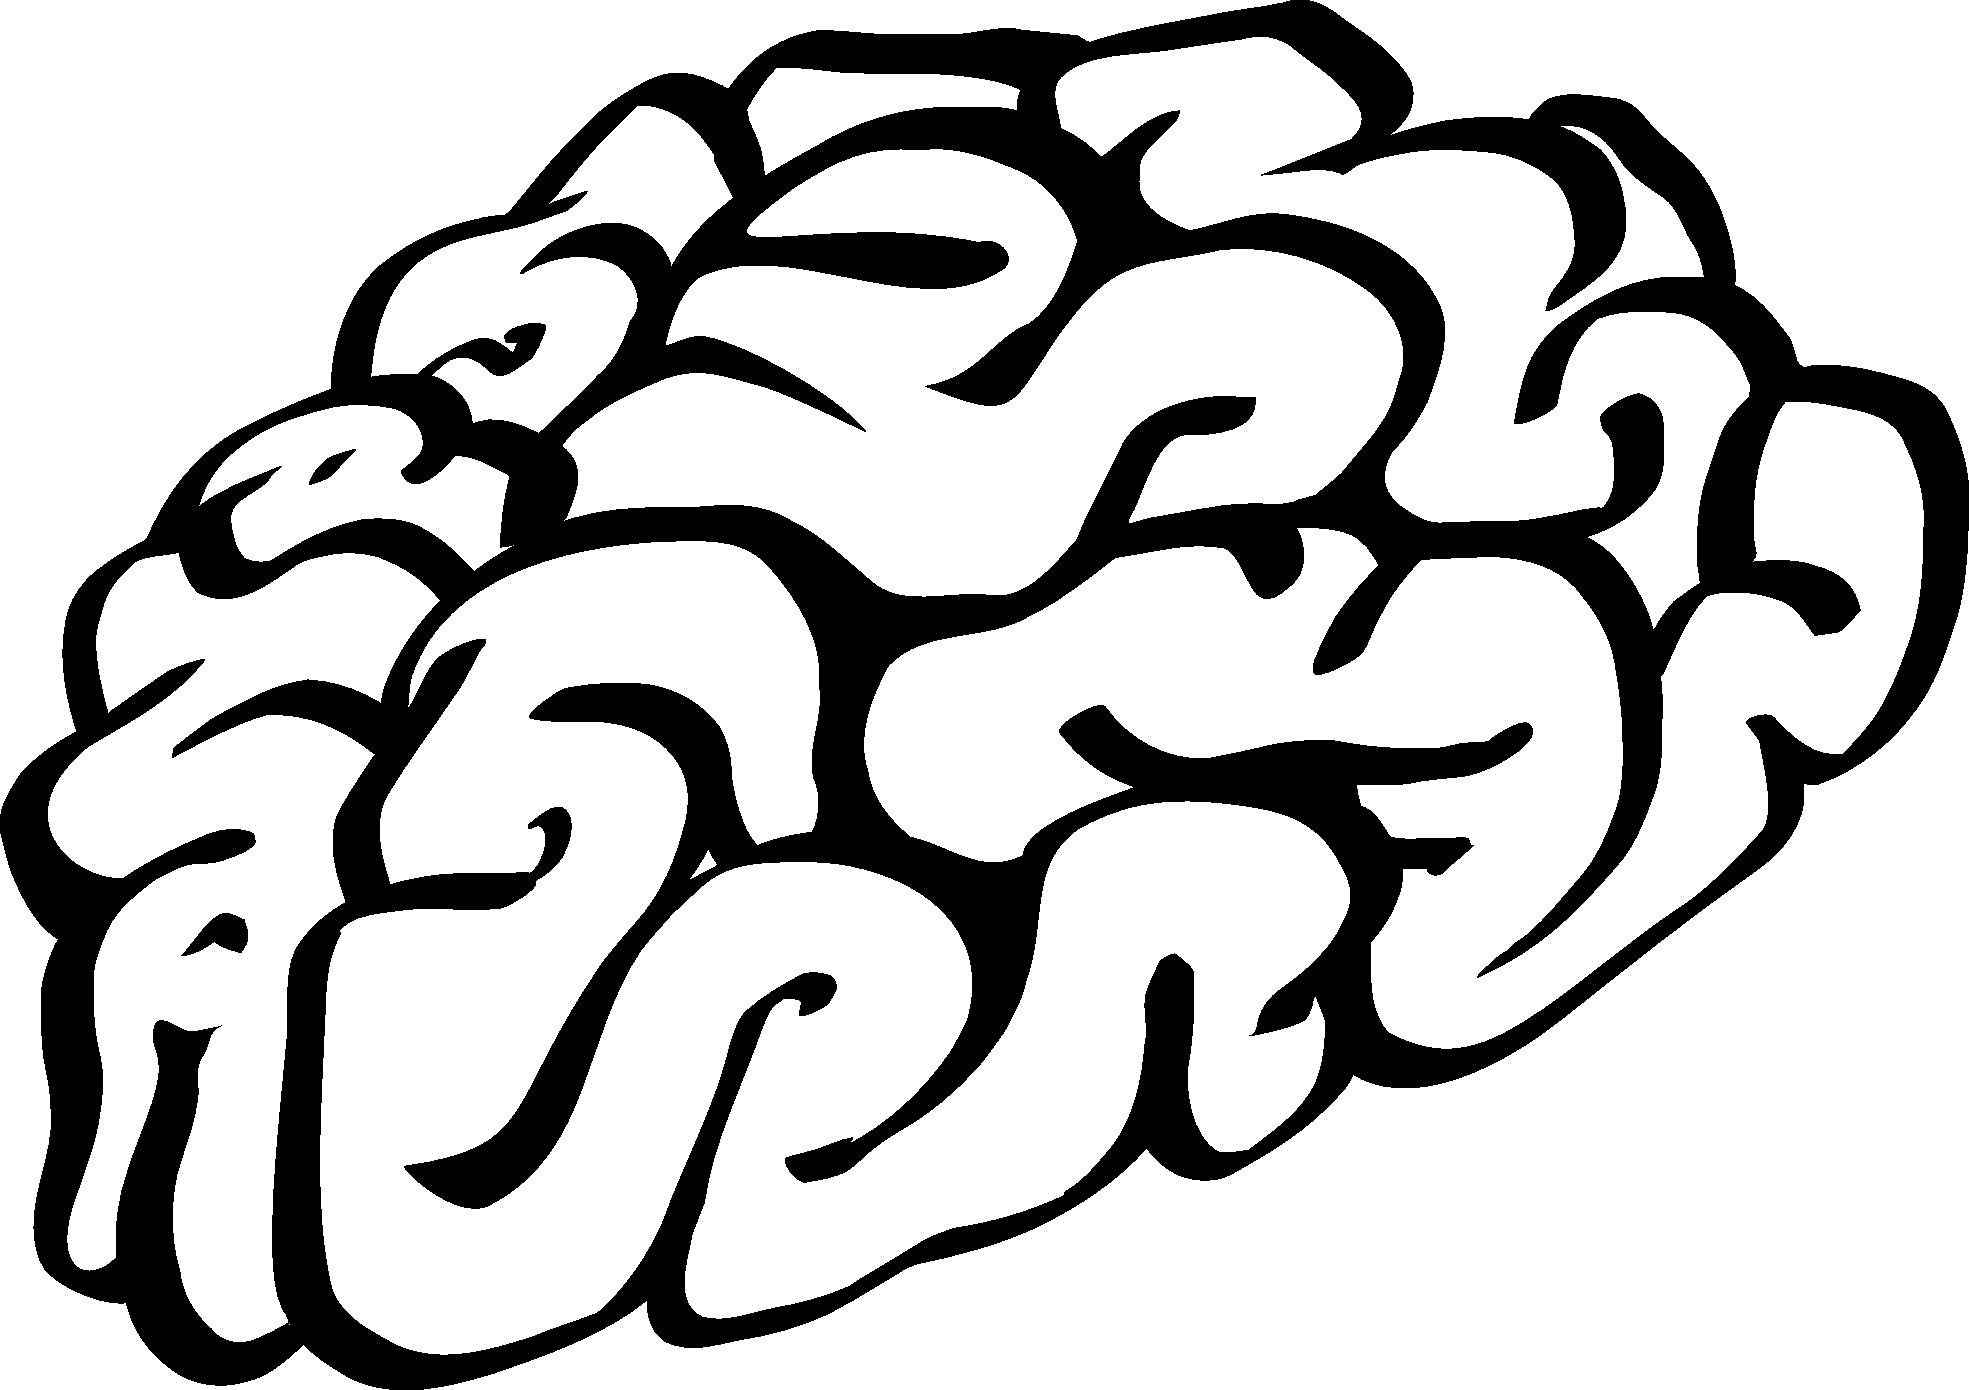 Brain Clip Art Black And White Human Bra-Brain clip art black and white human brain cartoon of a black-1